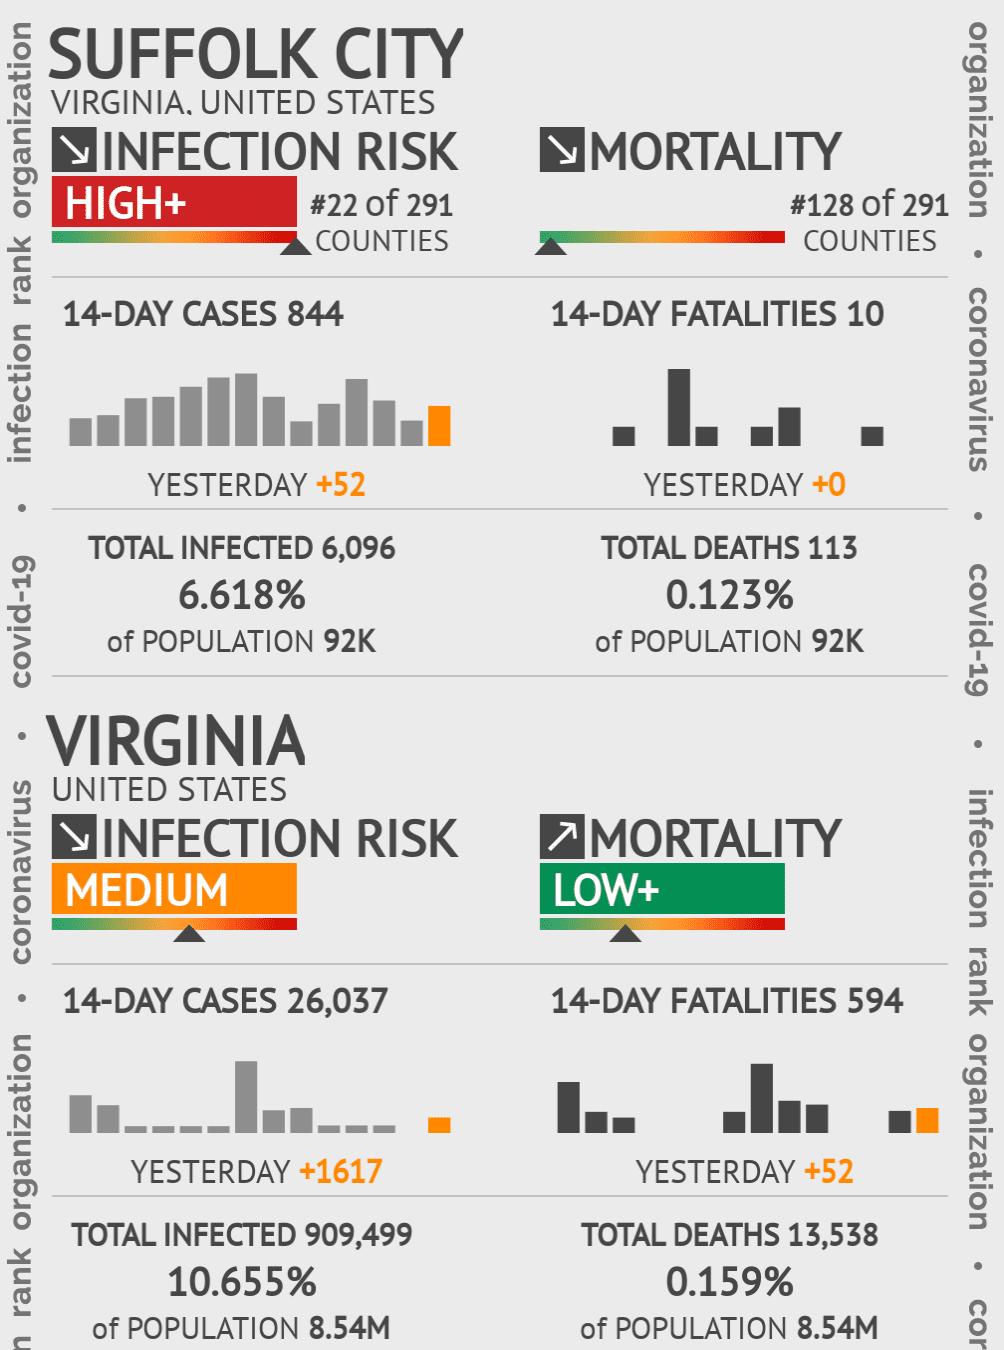 Suffolk City Coronavirus Covid-19 Risk of Infection on February 04, 2021